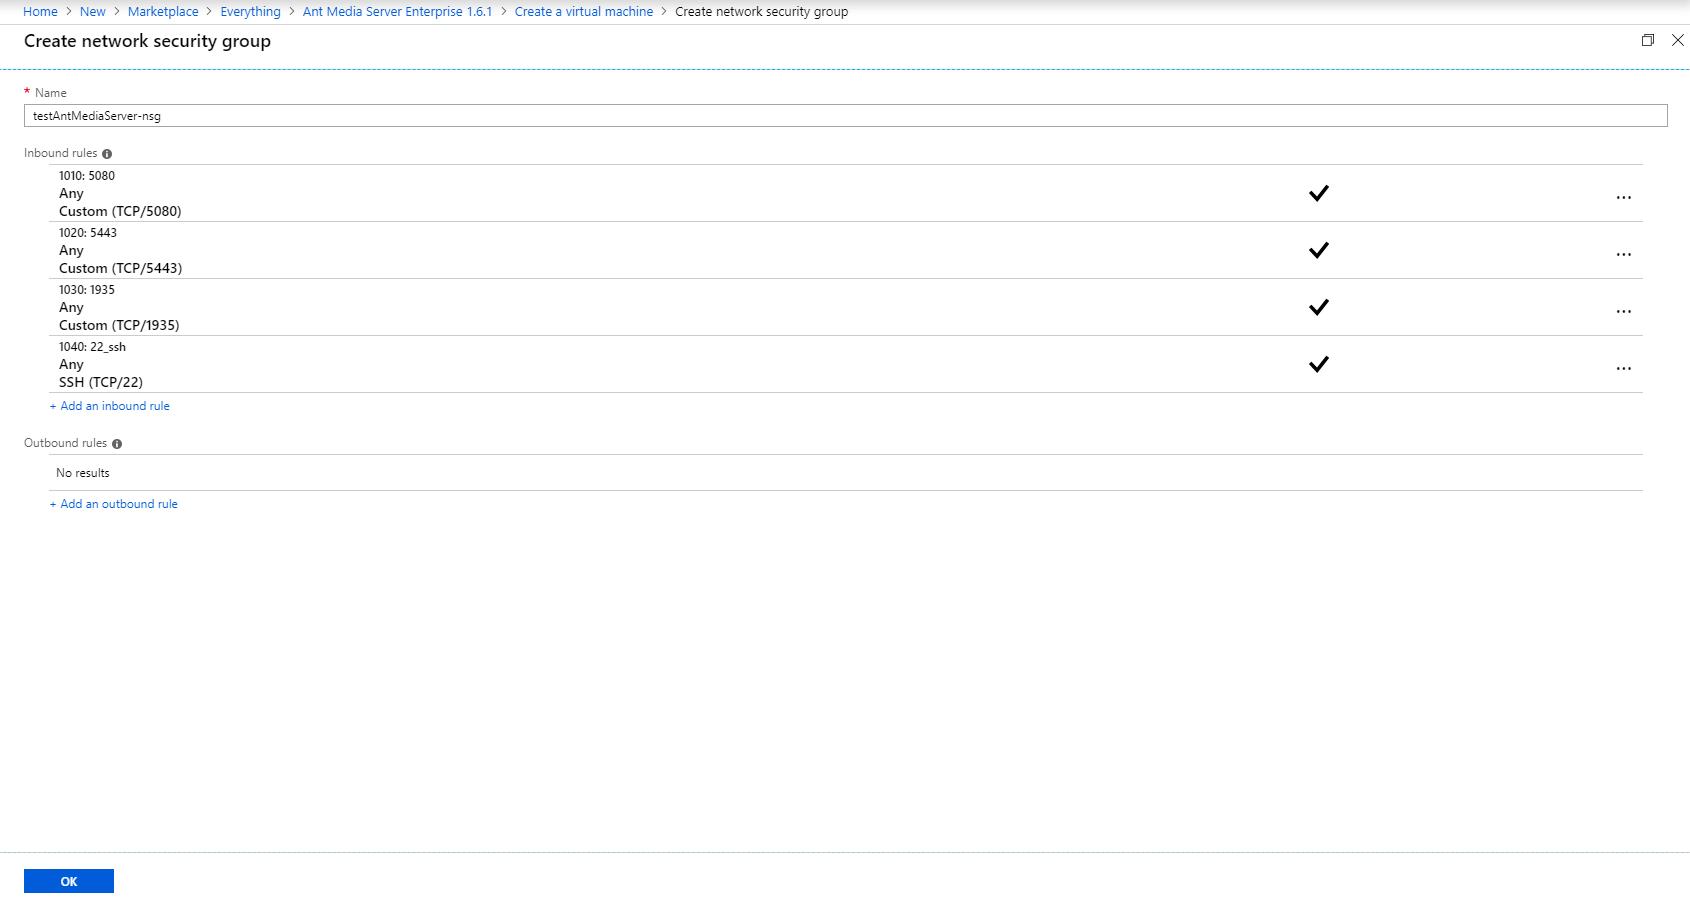 How to Use Ant Media Server on Azure Marketplace ? - Ant Media